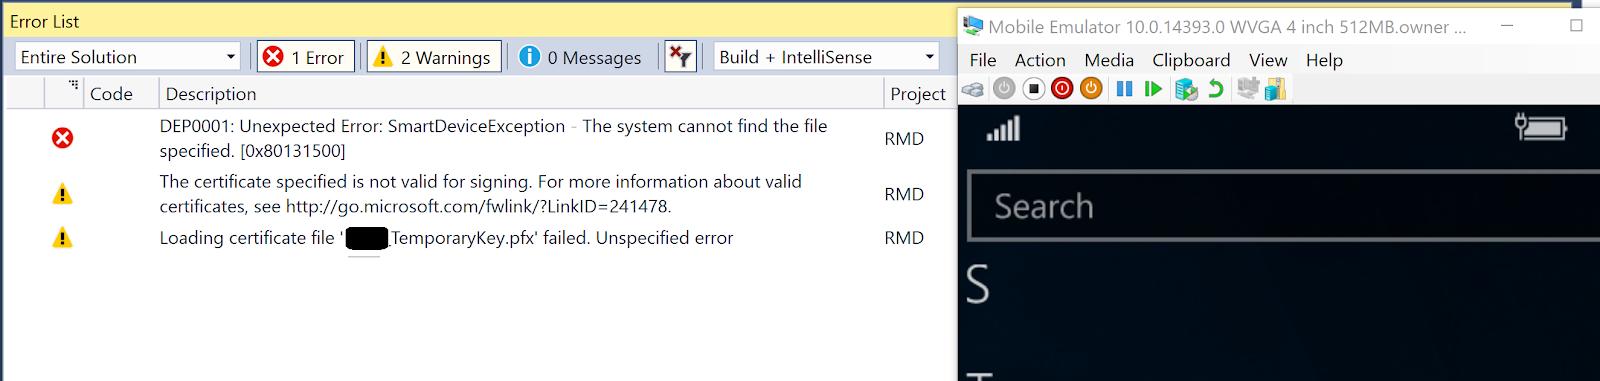 UWP : Visual Studio 2017 Community error 'App Didn't Start'